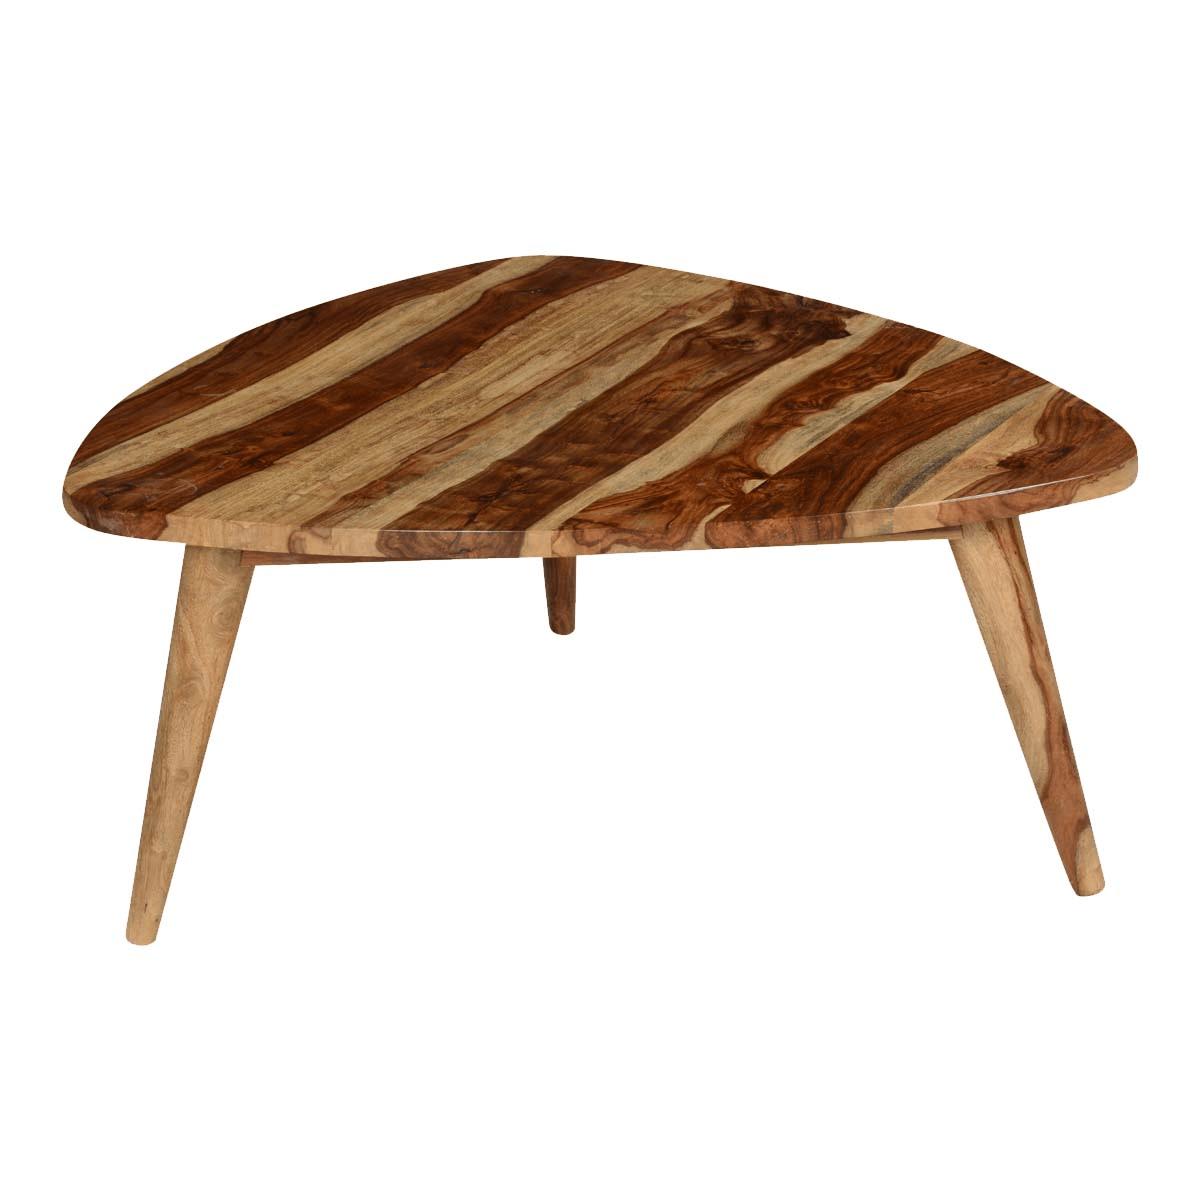 Triangular Coffee Table For Unique Small Living Room Design Ideas